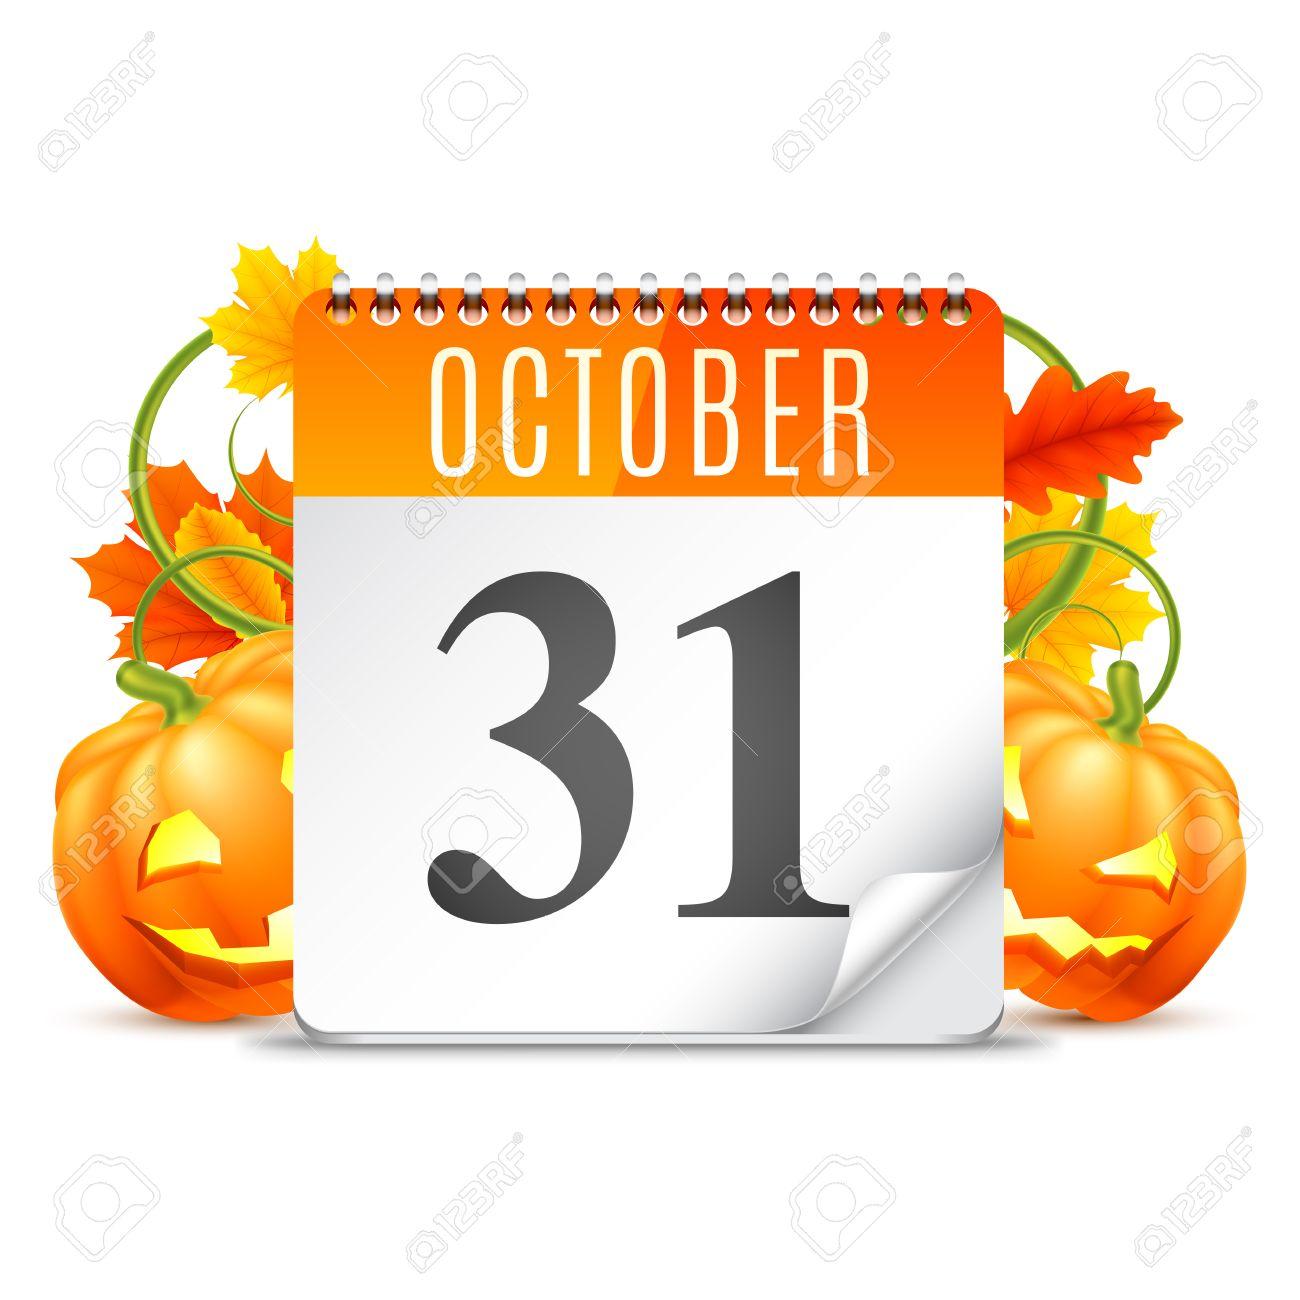 Halloween Calendar With October 31 Date, Pumpkins And Autumn ...